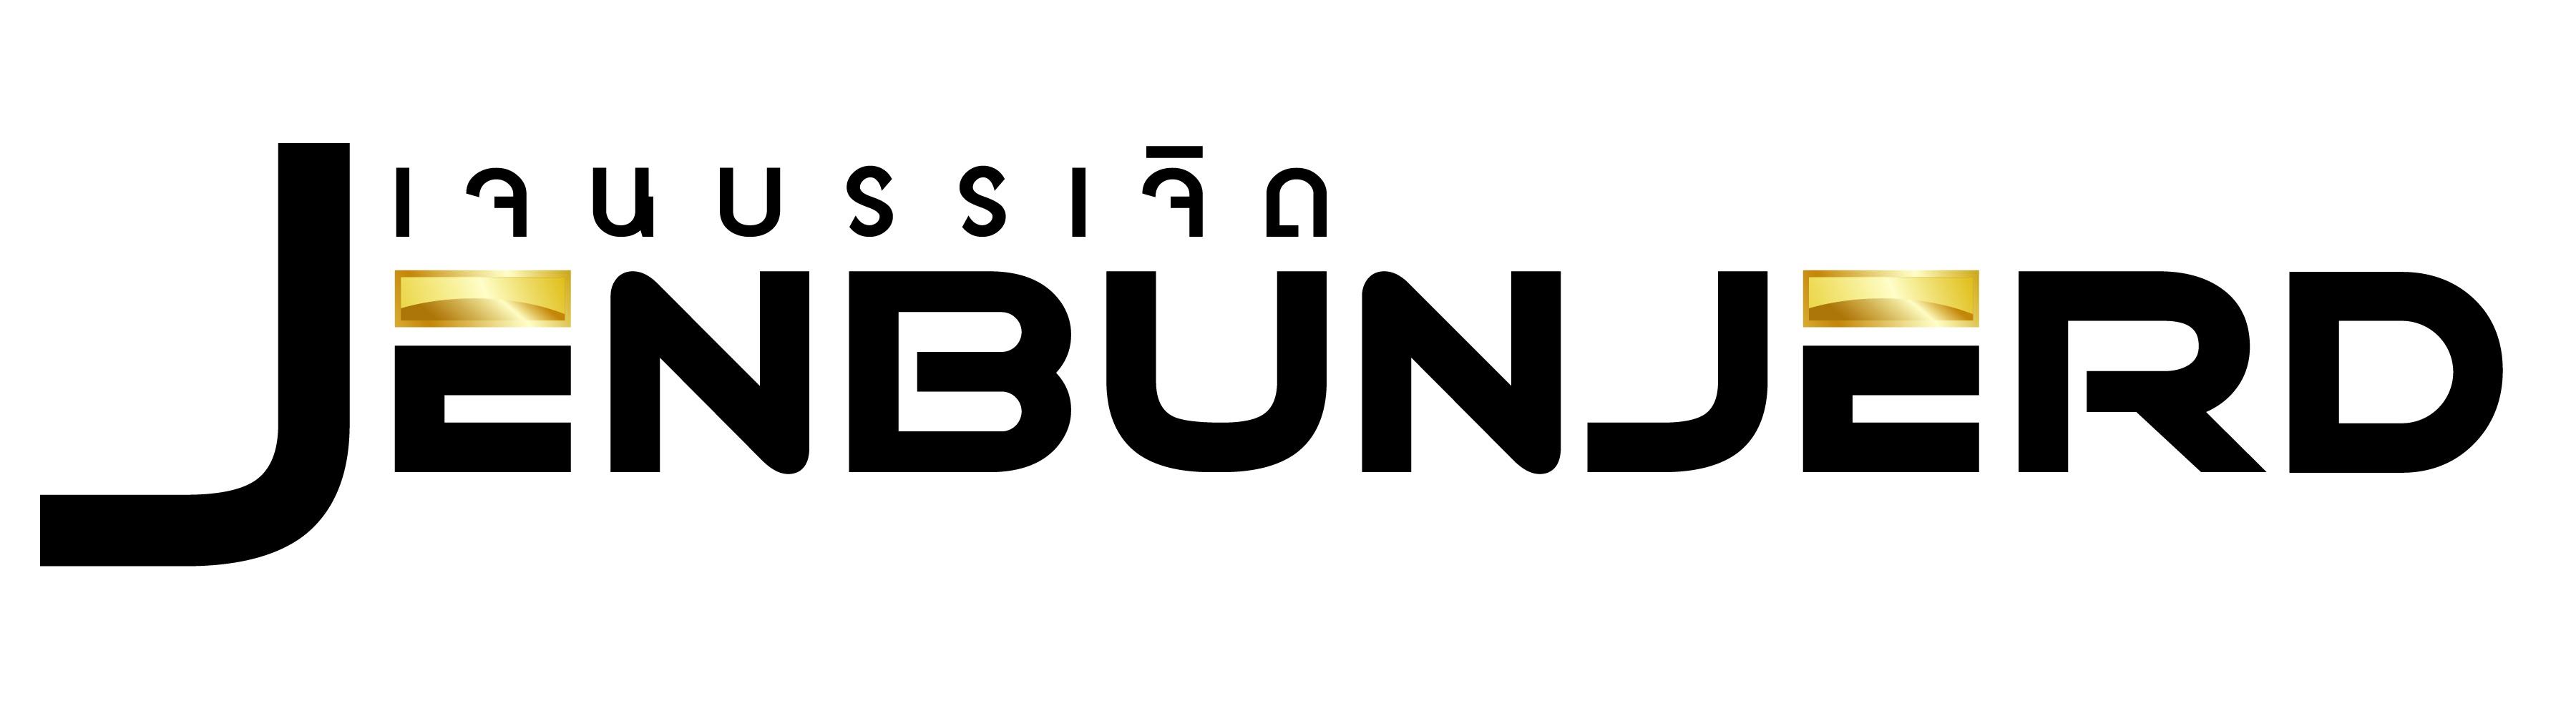 Jenbunjerd Co.,Ltd